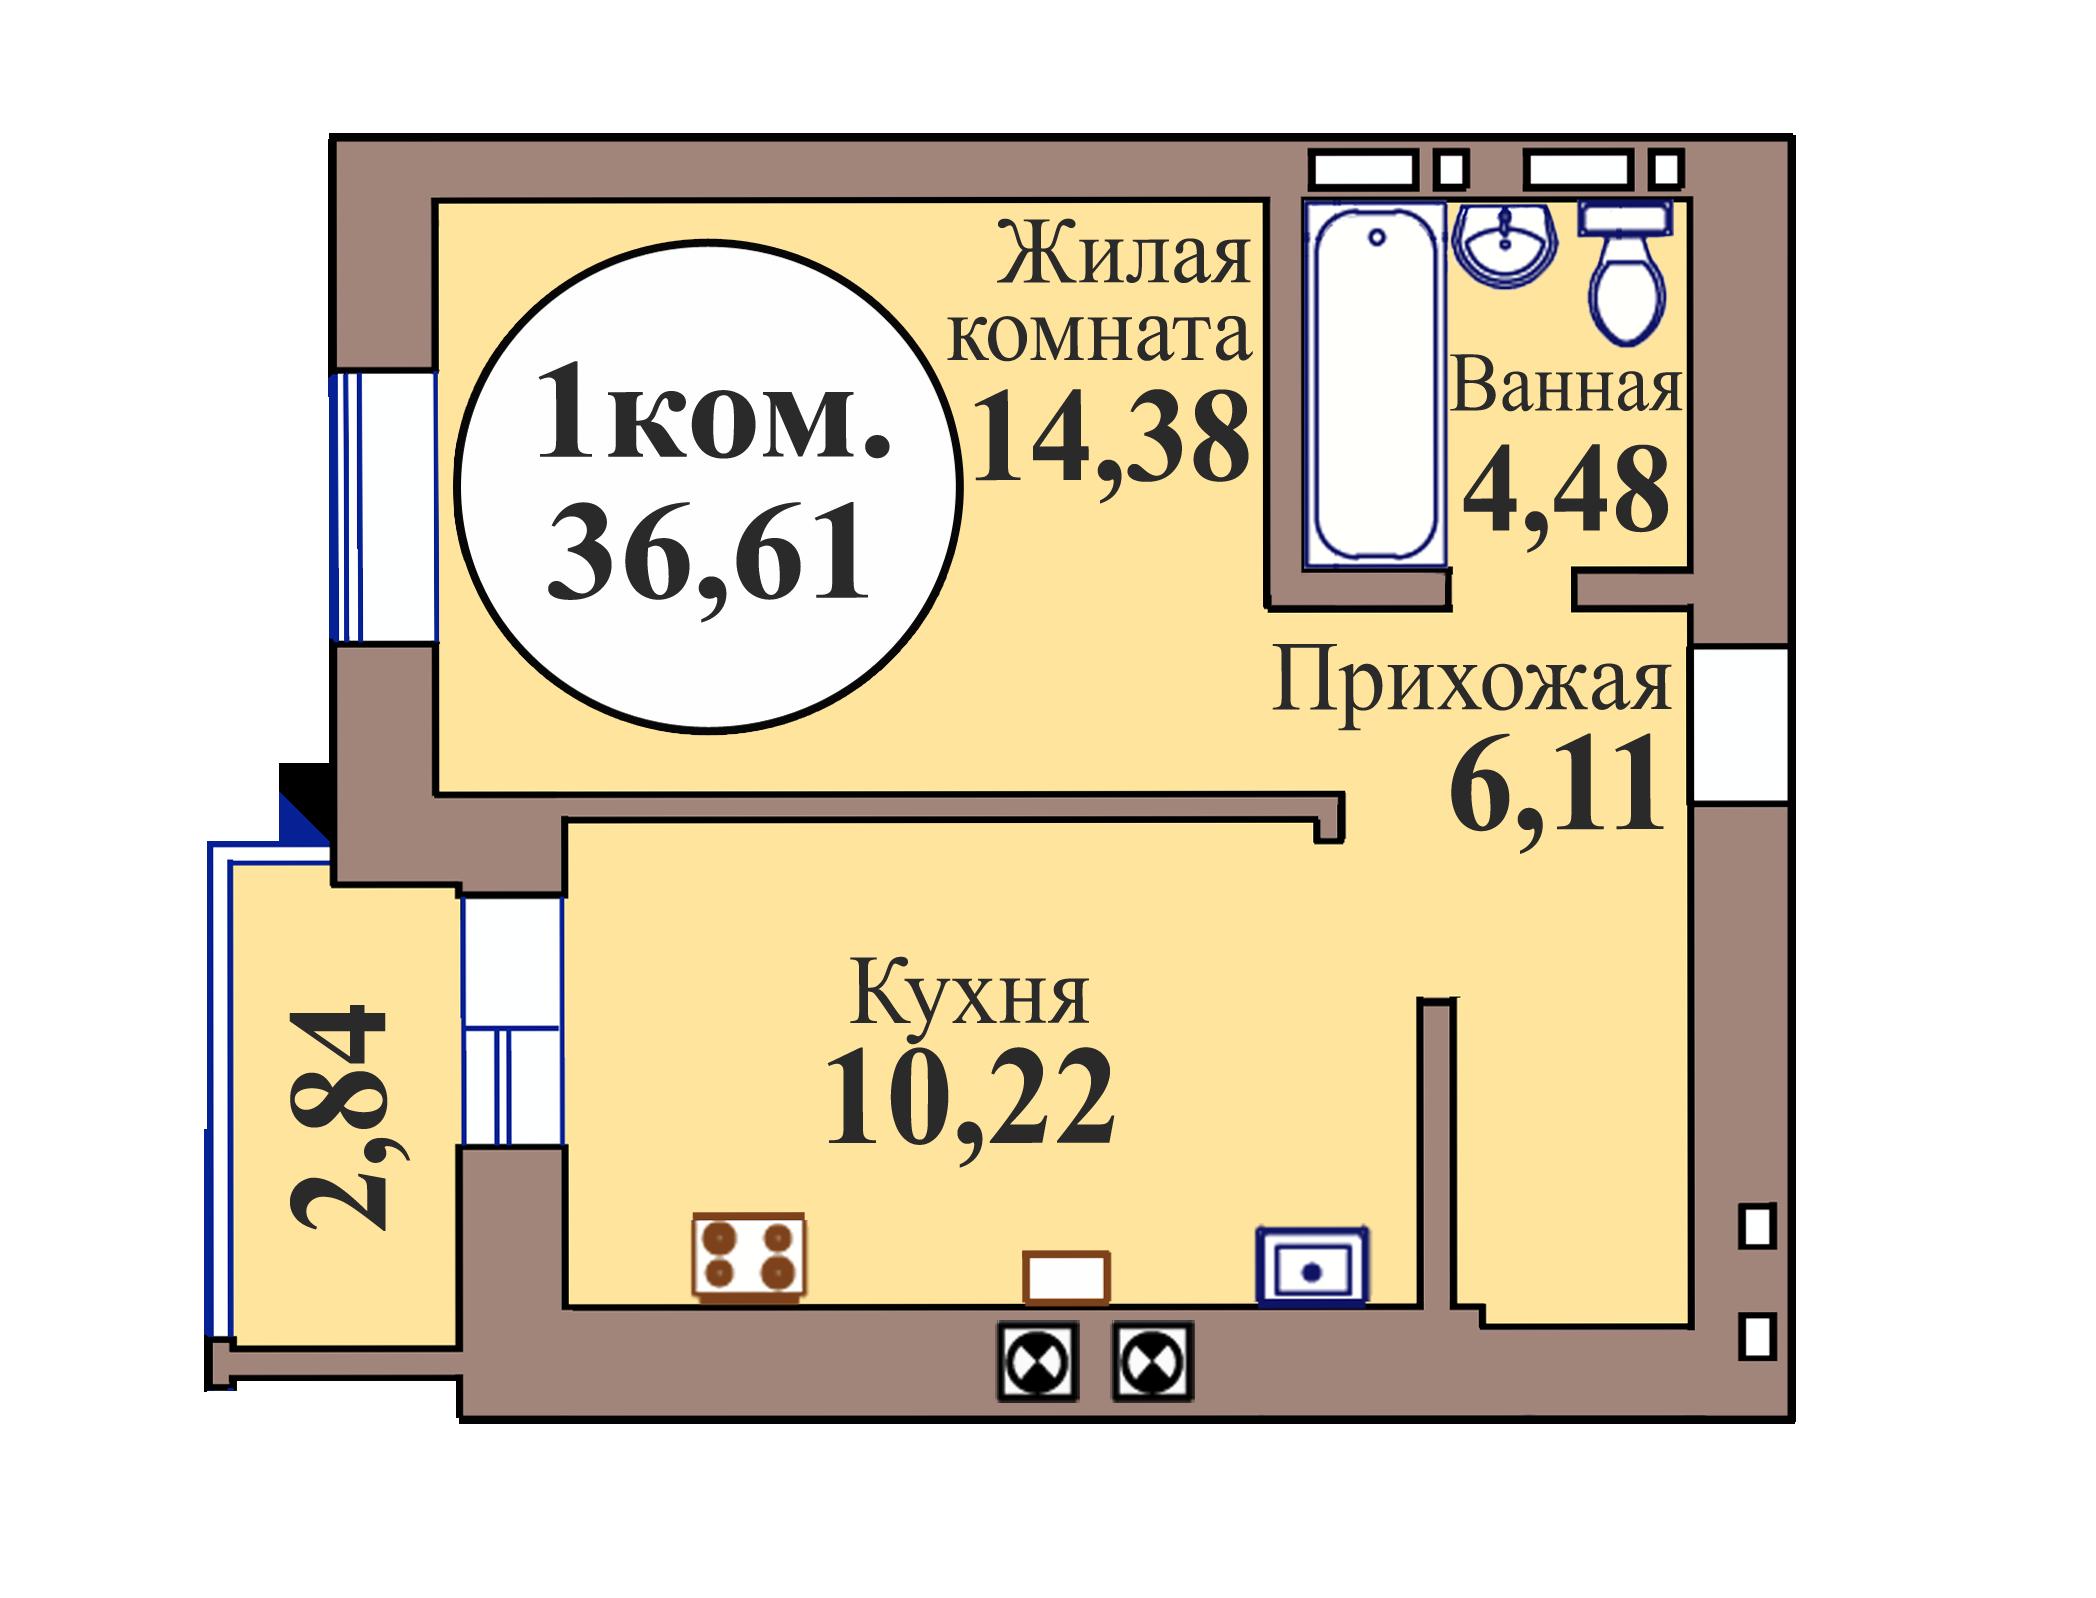 1-комн. кв. по пер. Калининградский, 5 кв. 208 в Калининграде